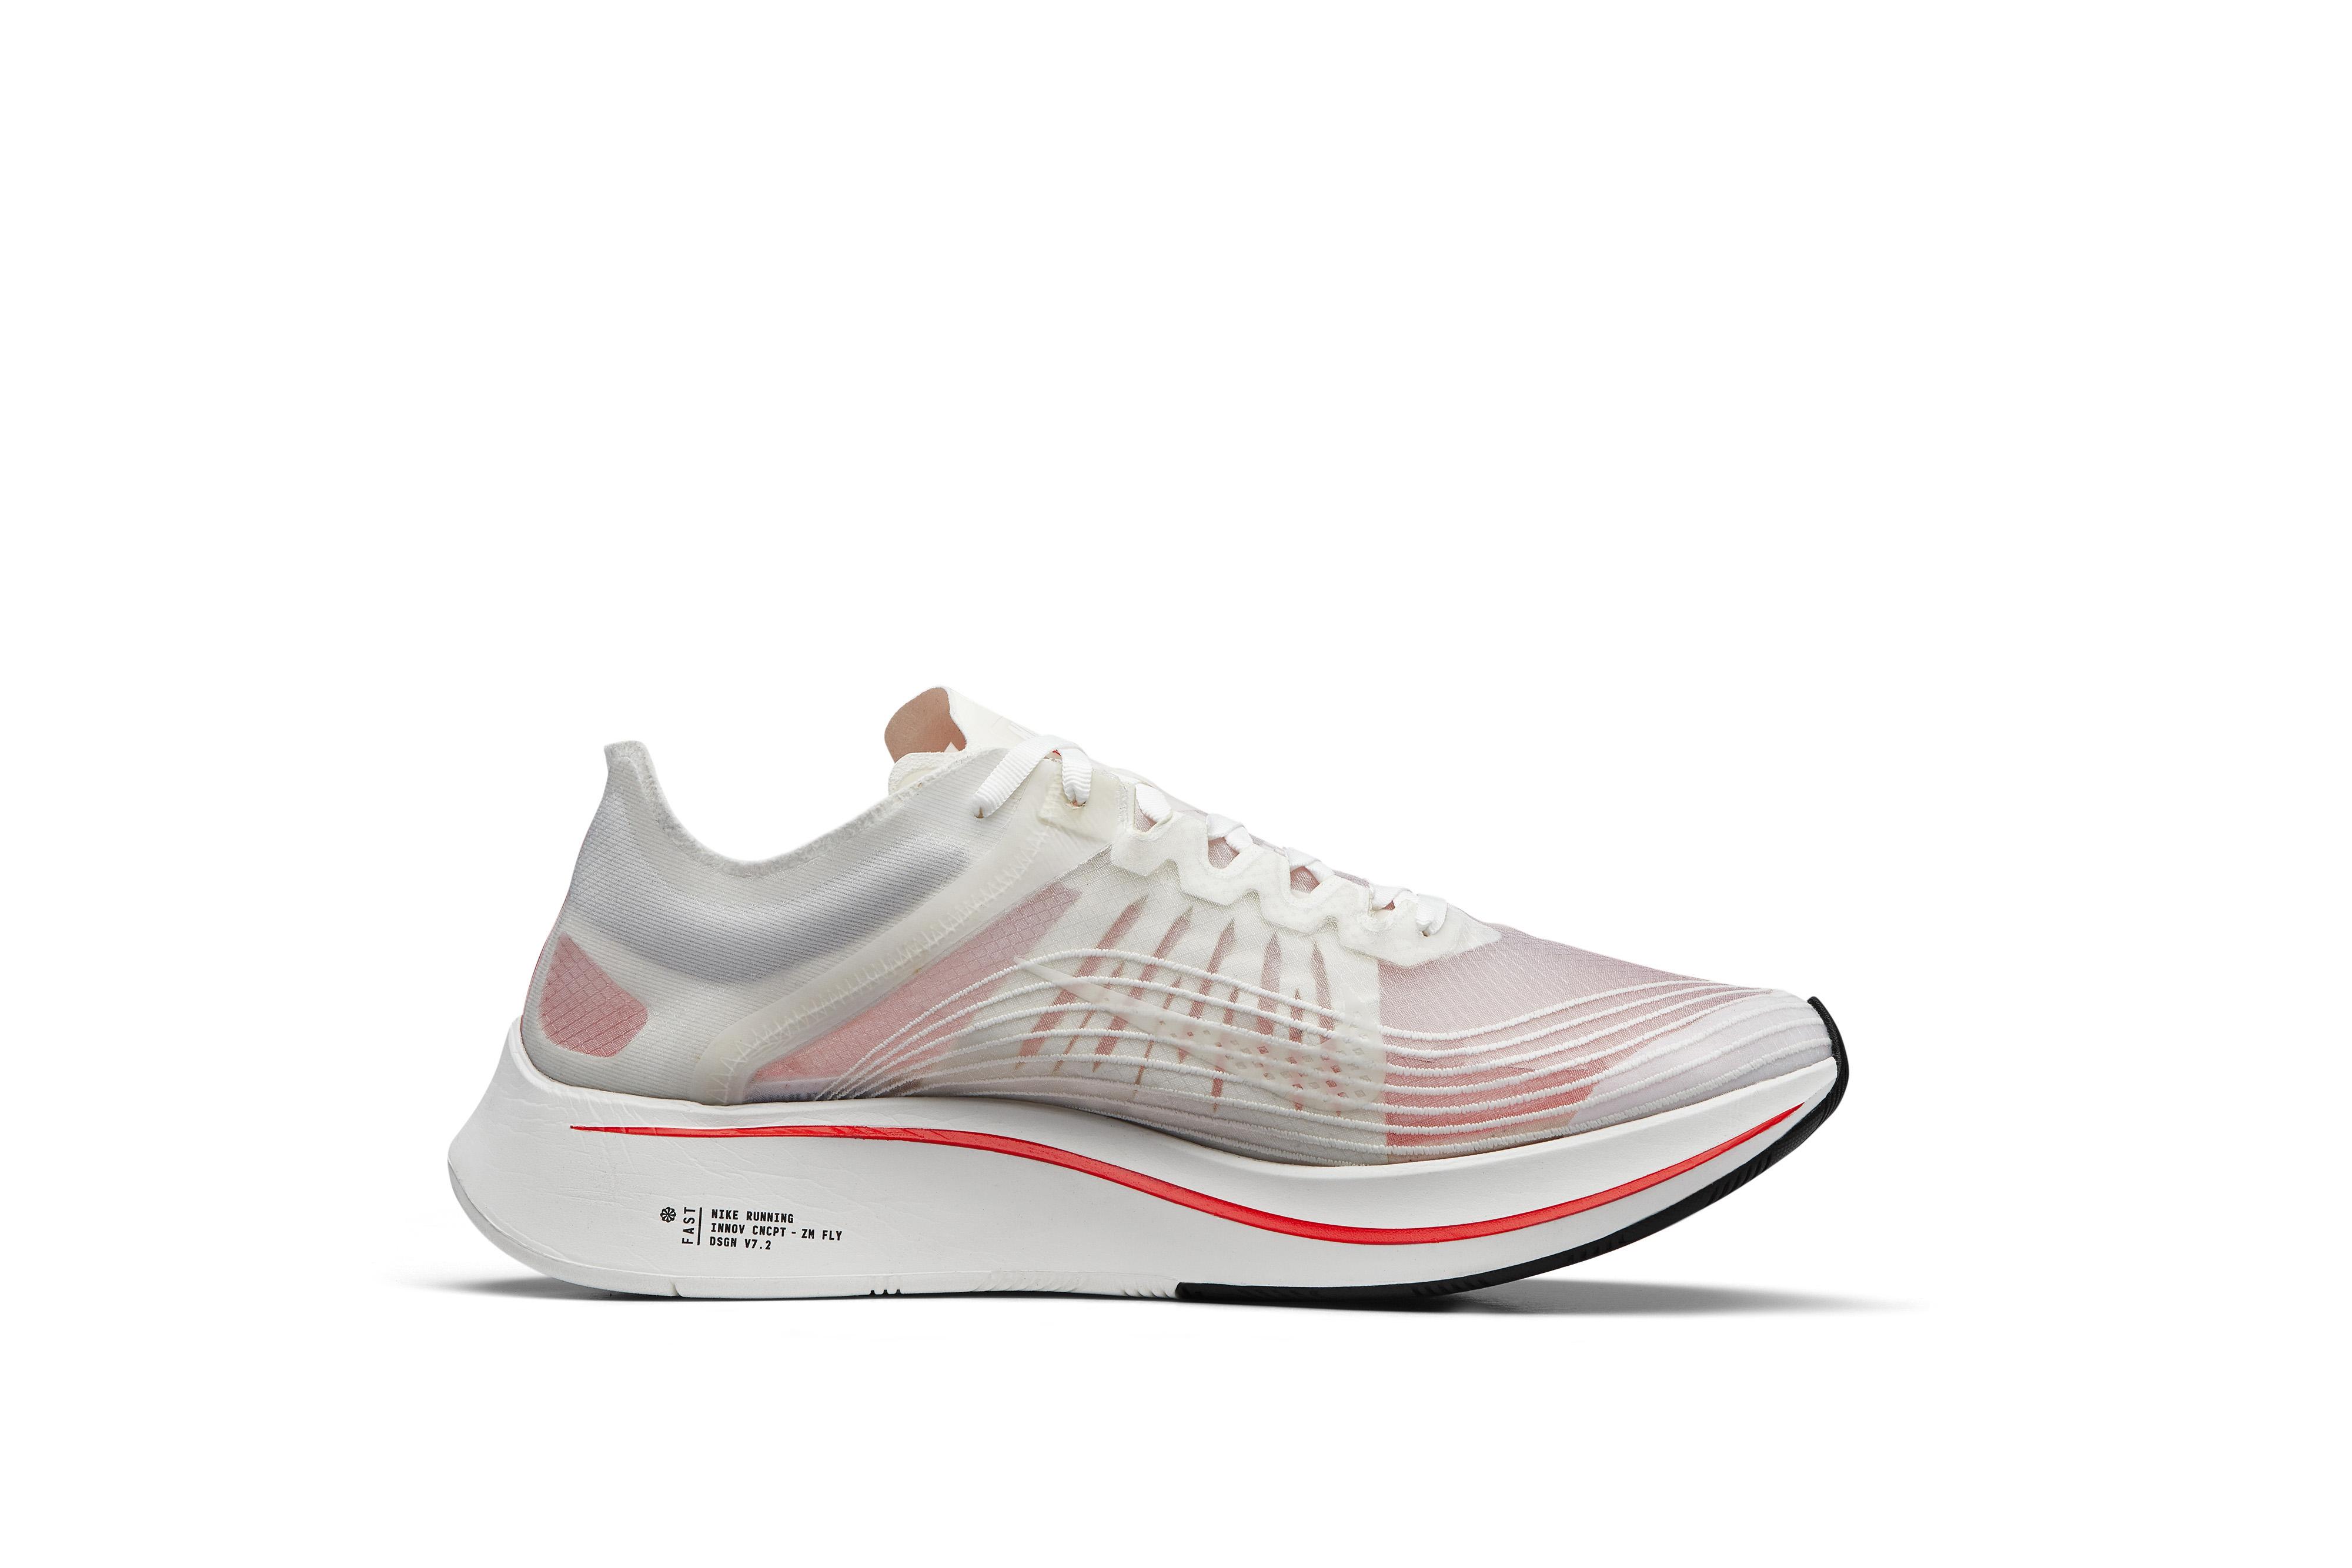 NikeLab-Zoom-VaporFly-SP-08